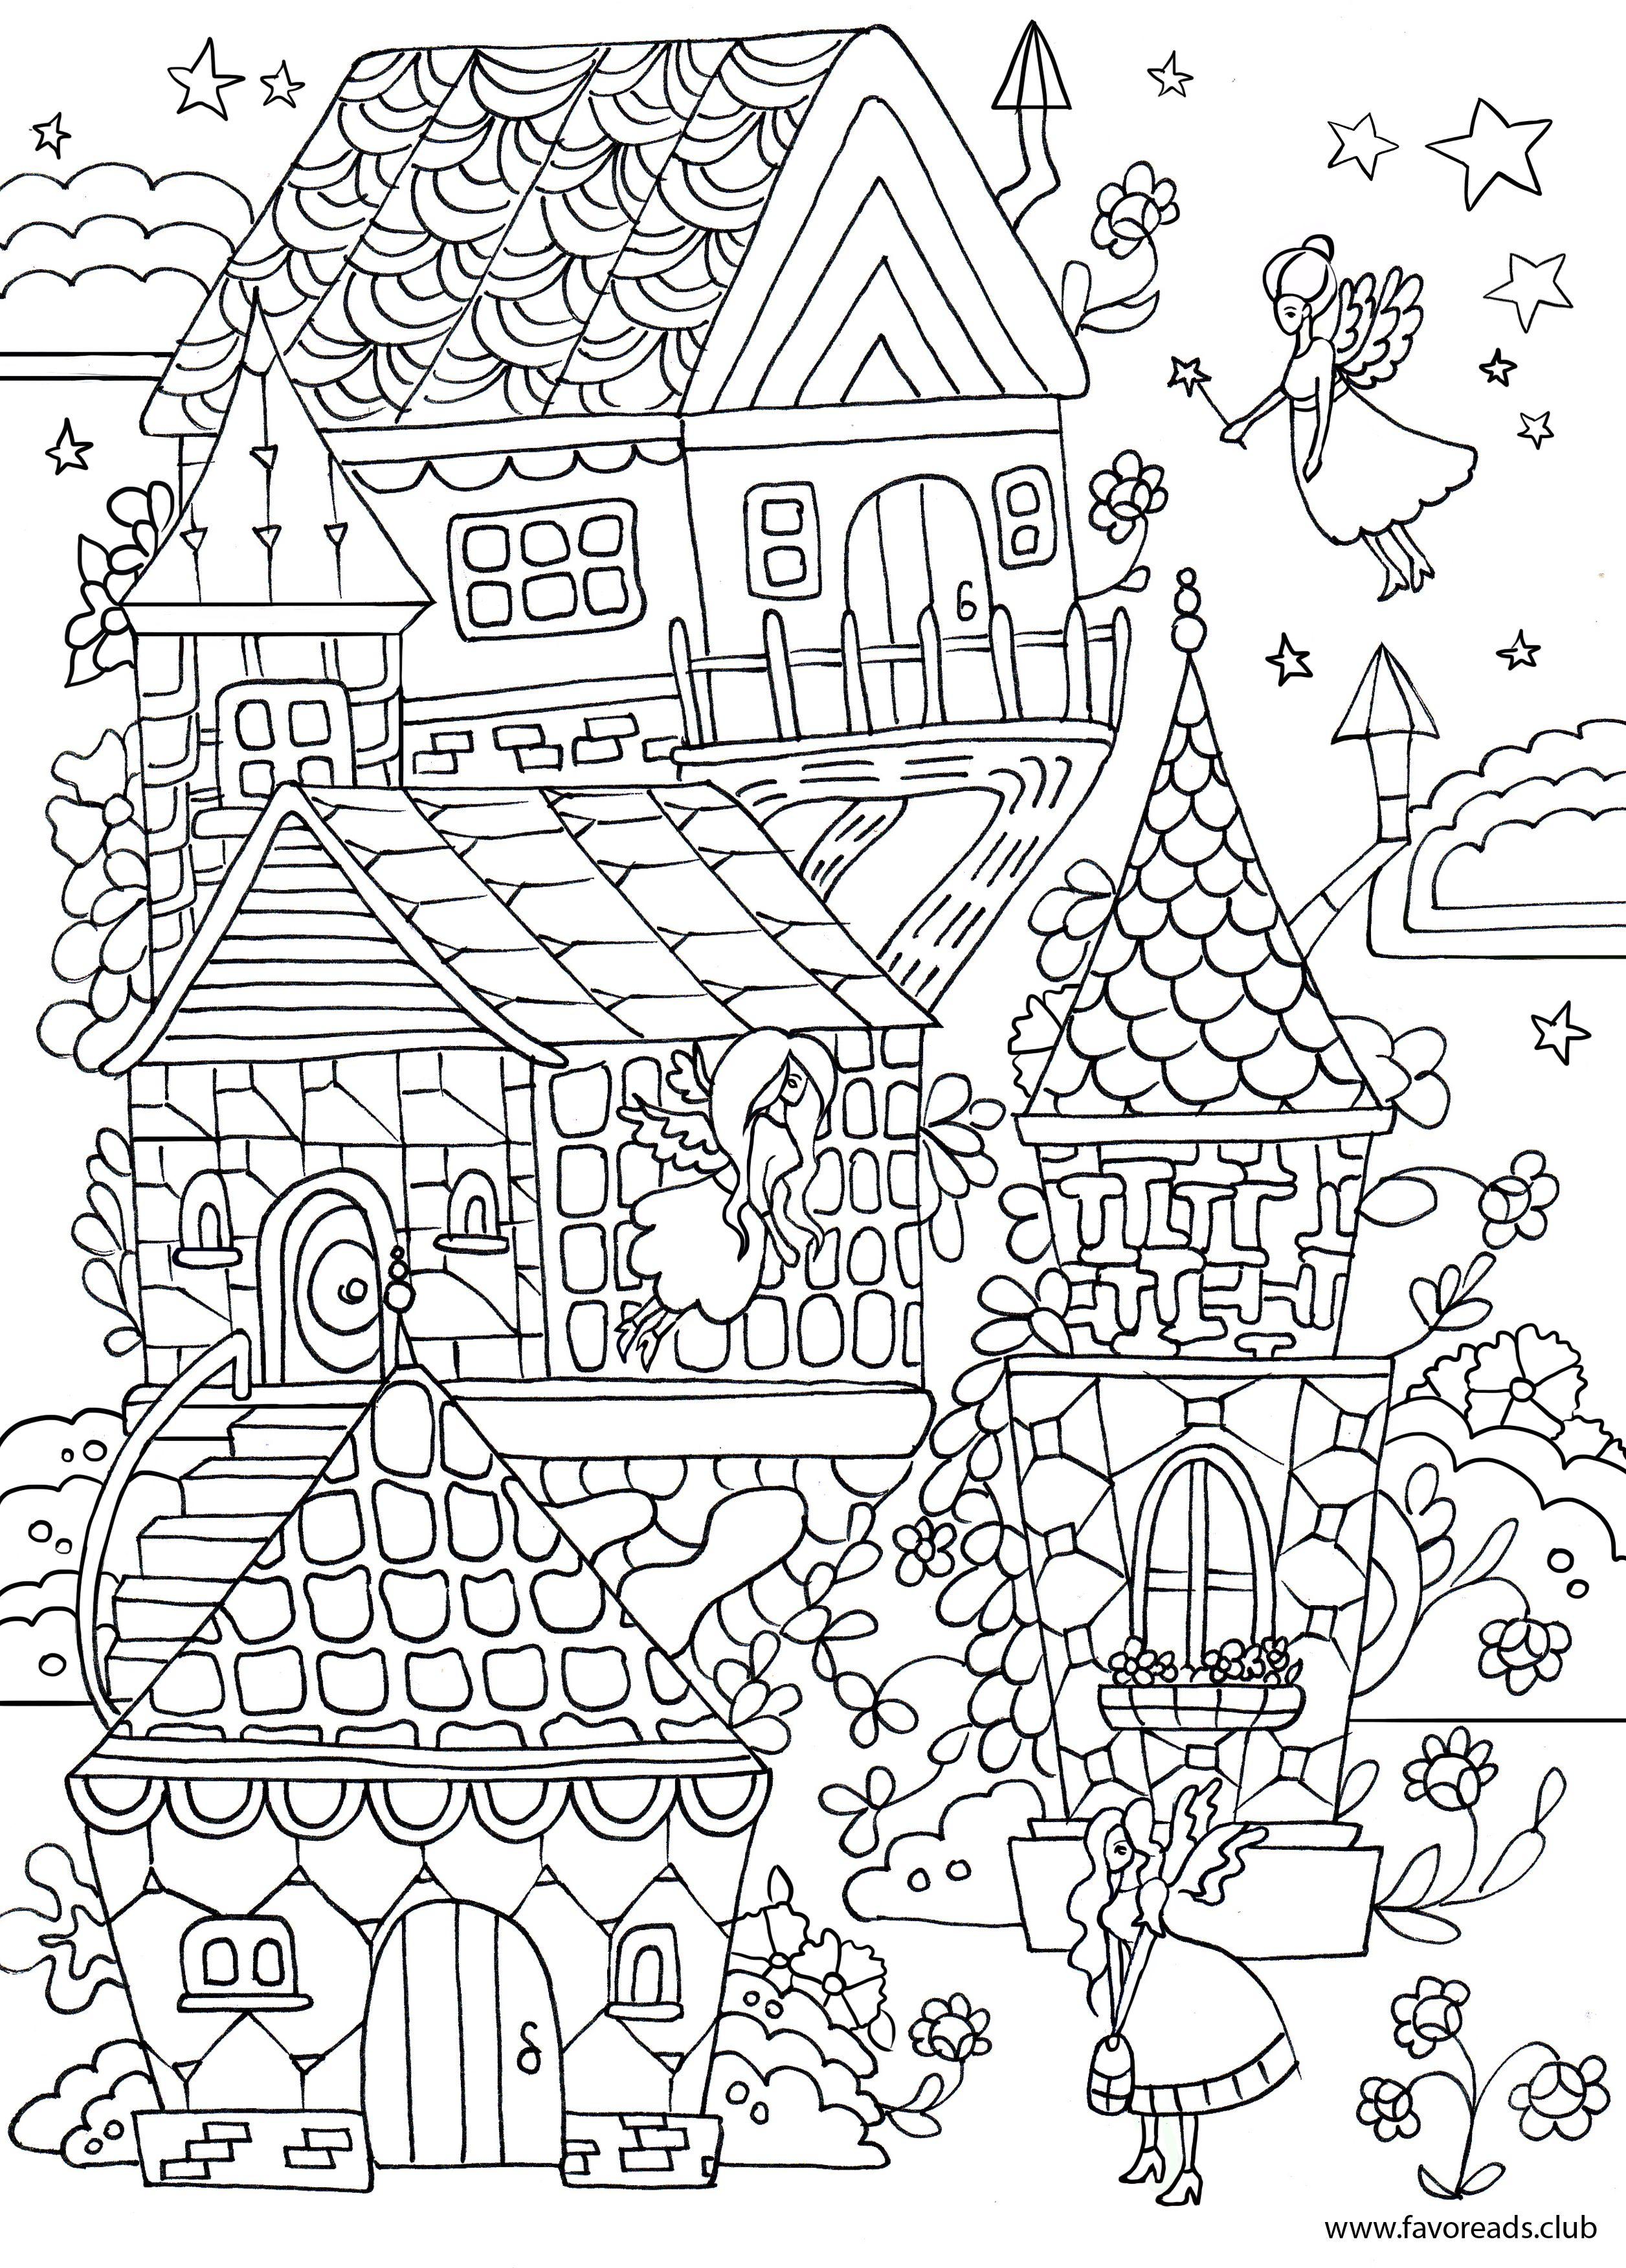 Favoreads Bonus Free Coloring Pages Free Kids Coloring Pages Coloring Pages